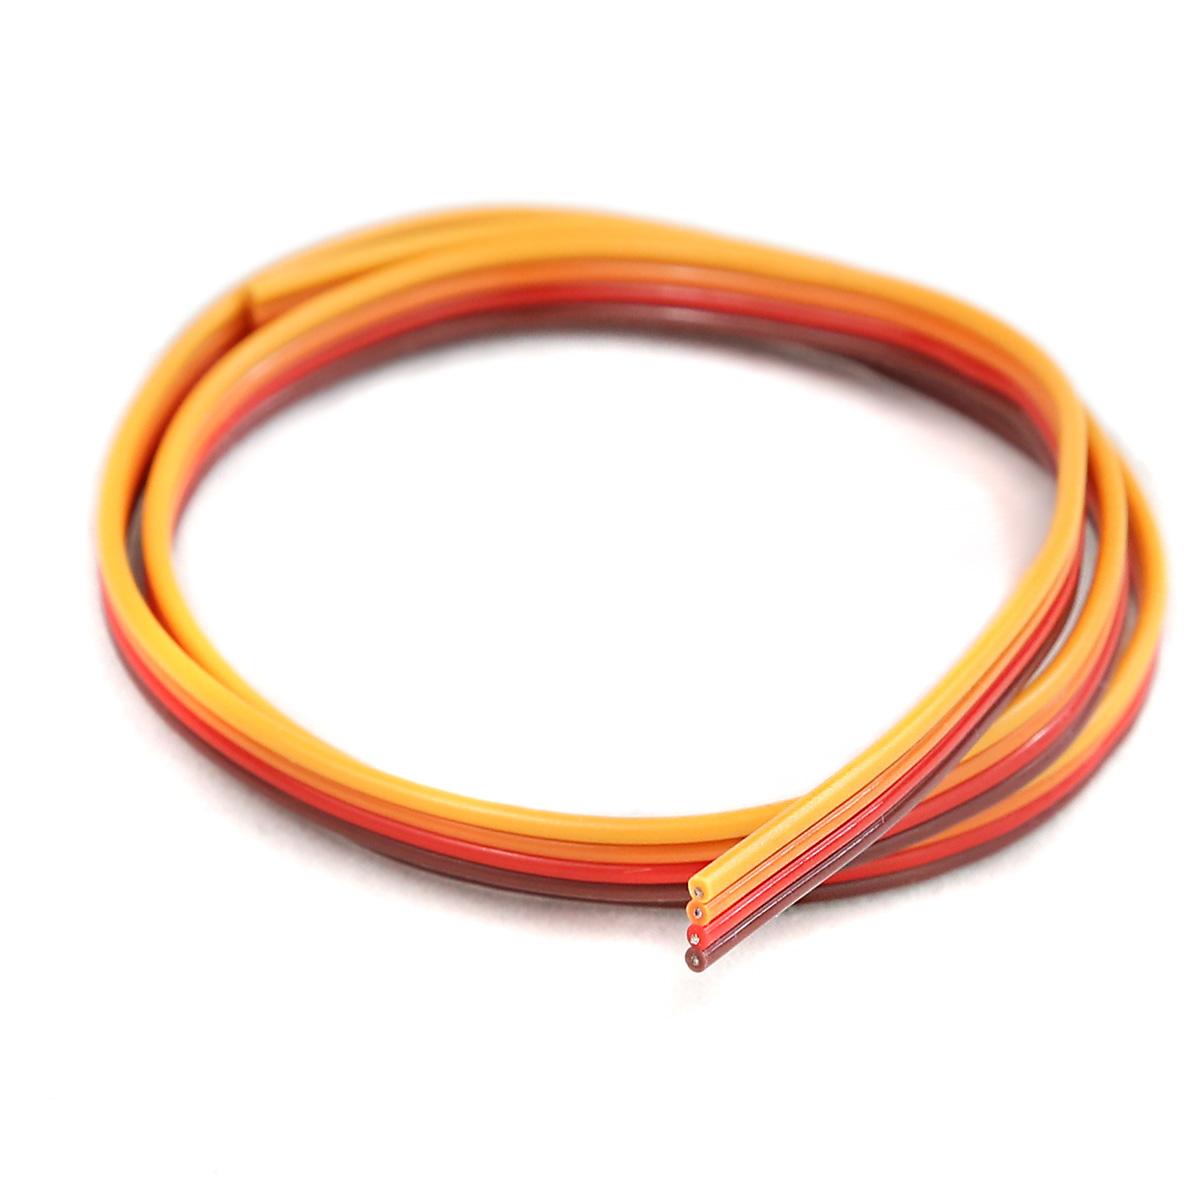 4 Lead servo wire extension – RCExplorer